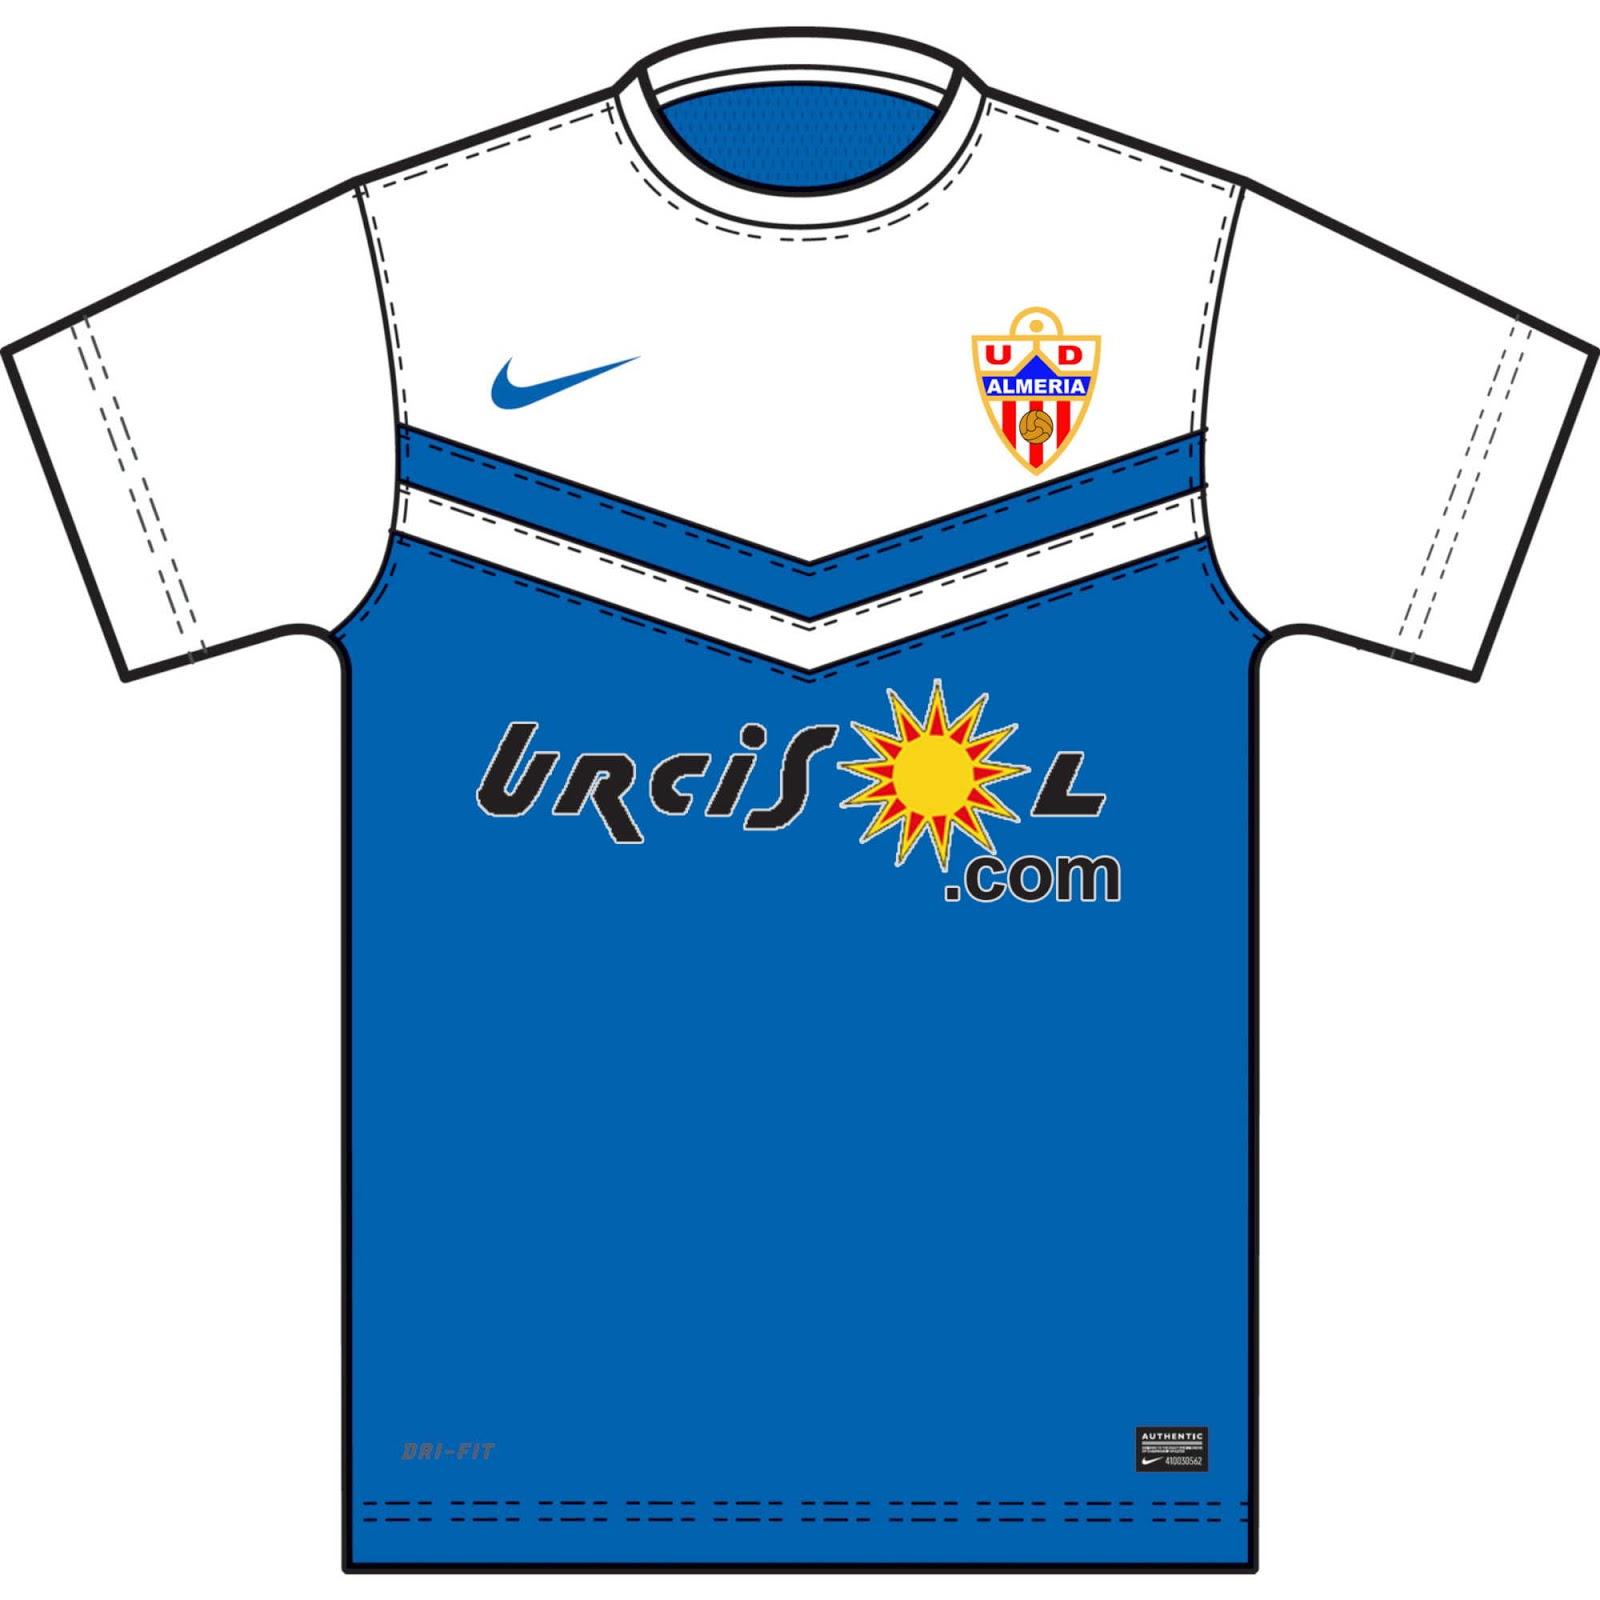 602b397914b Almería 2014-15 Away Shirt. This is the new Almería 14-15 Away Kit by Nike.